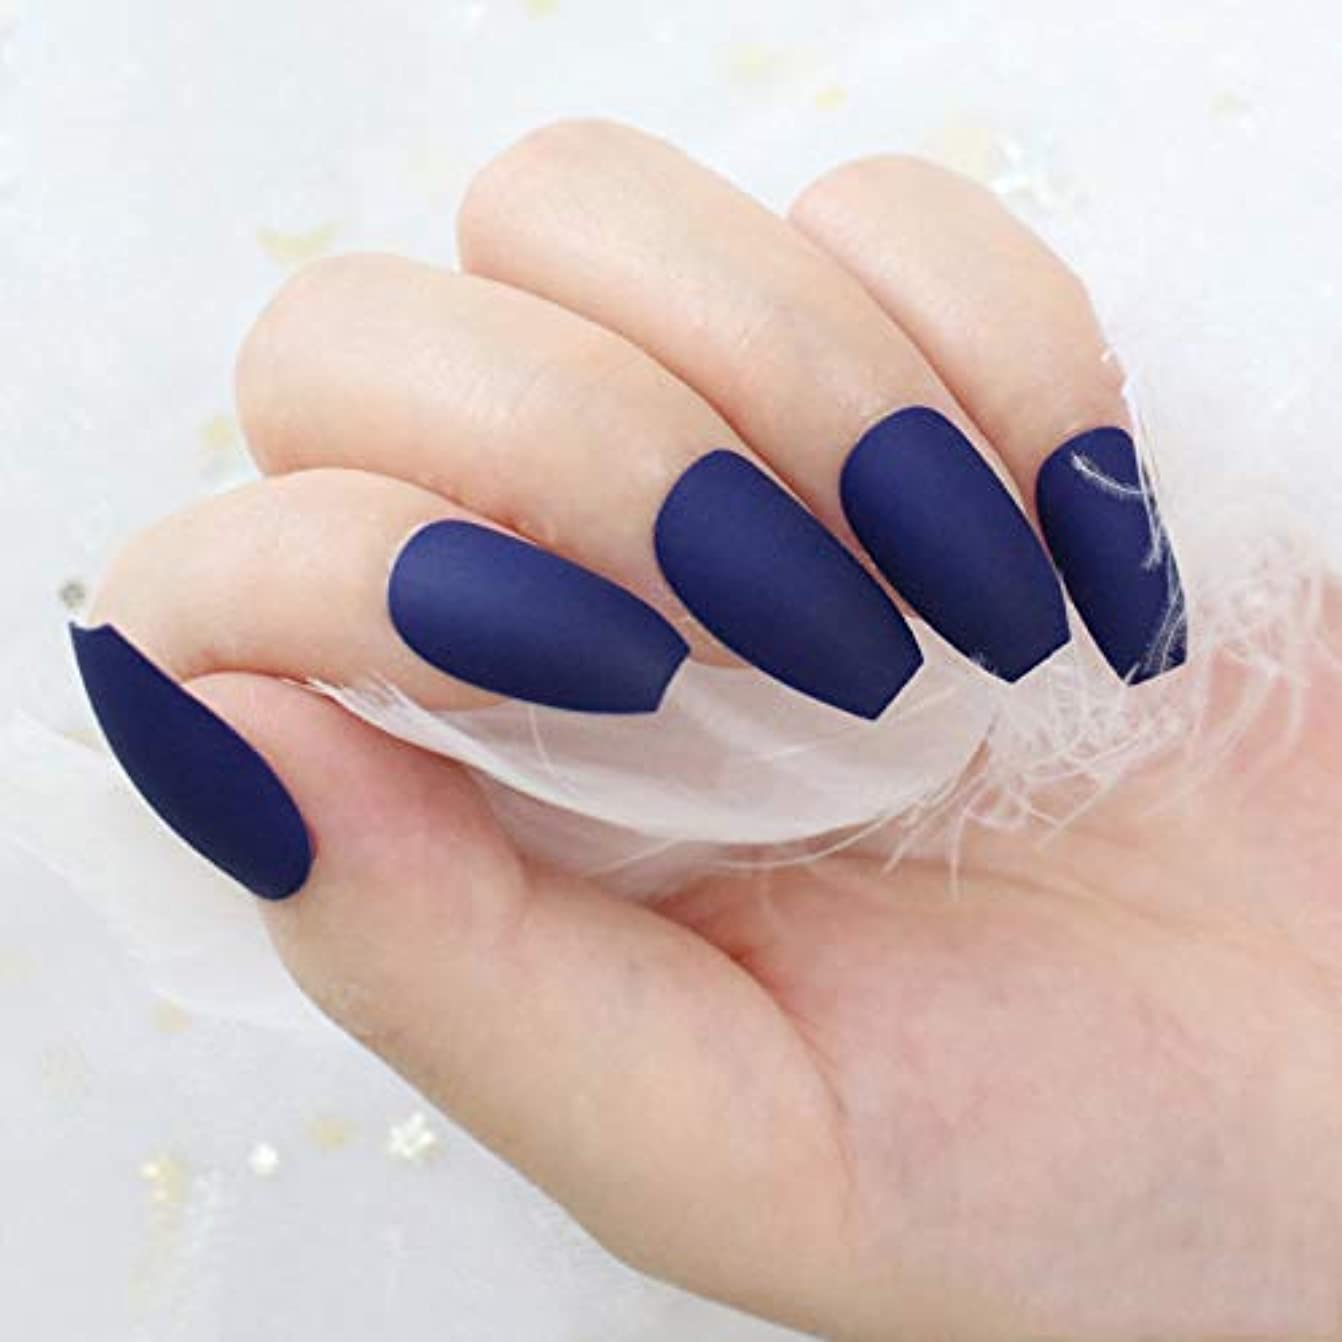 XUTXZKA 24個/セットマット偽ネイルフル女性偽爪ネイルアートデコレーションツール